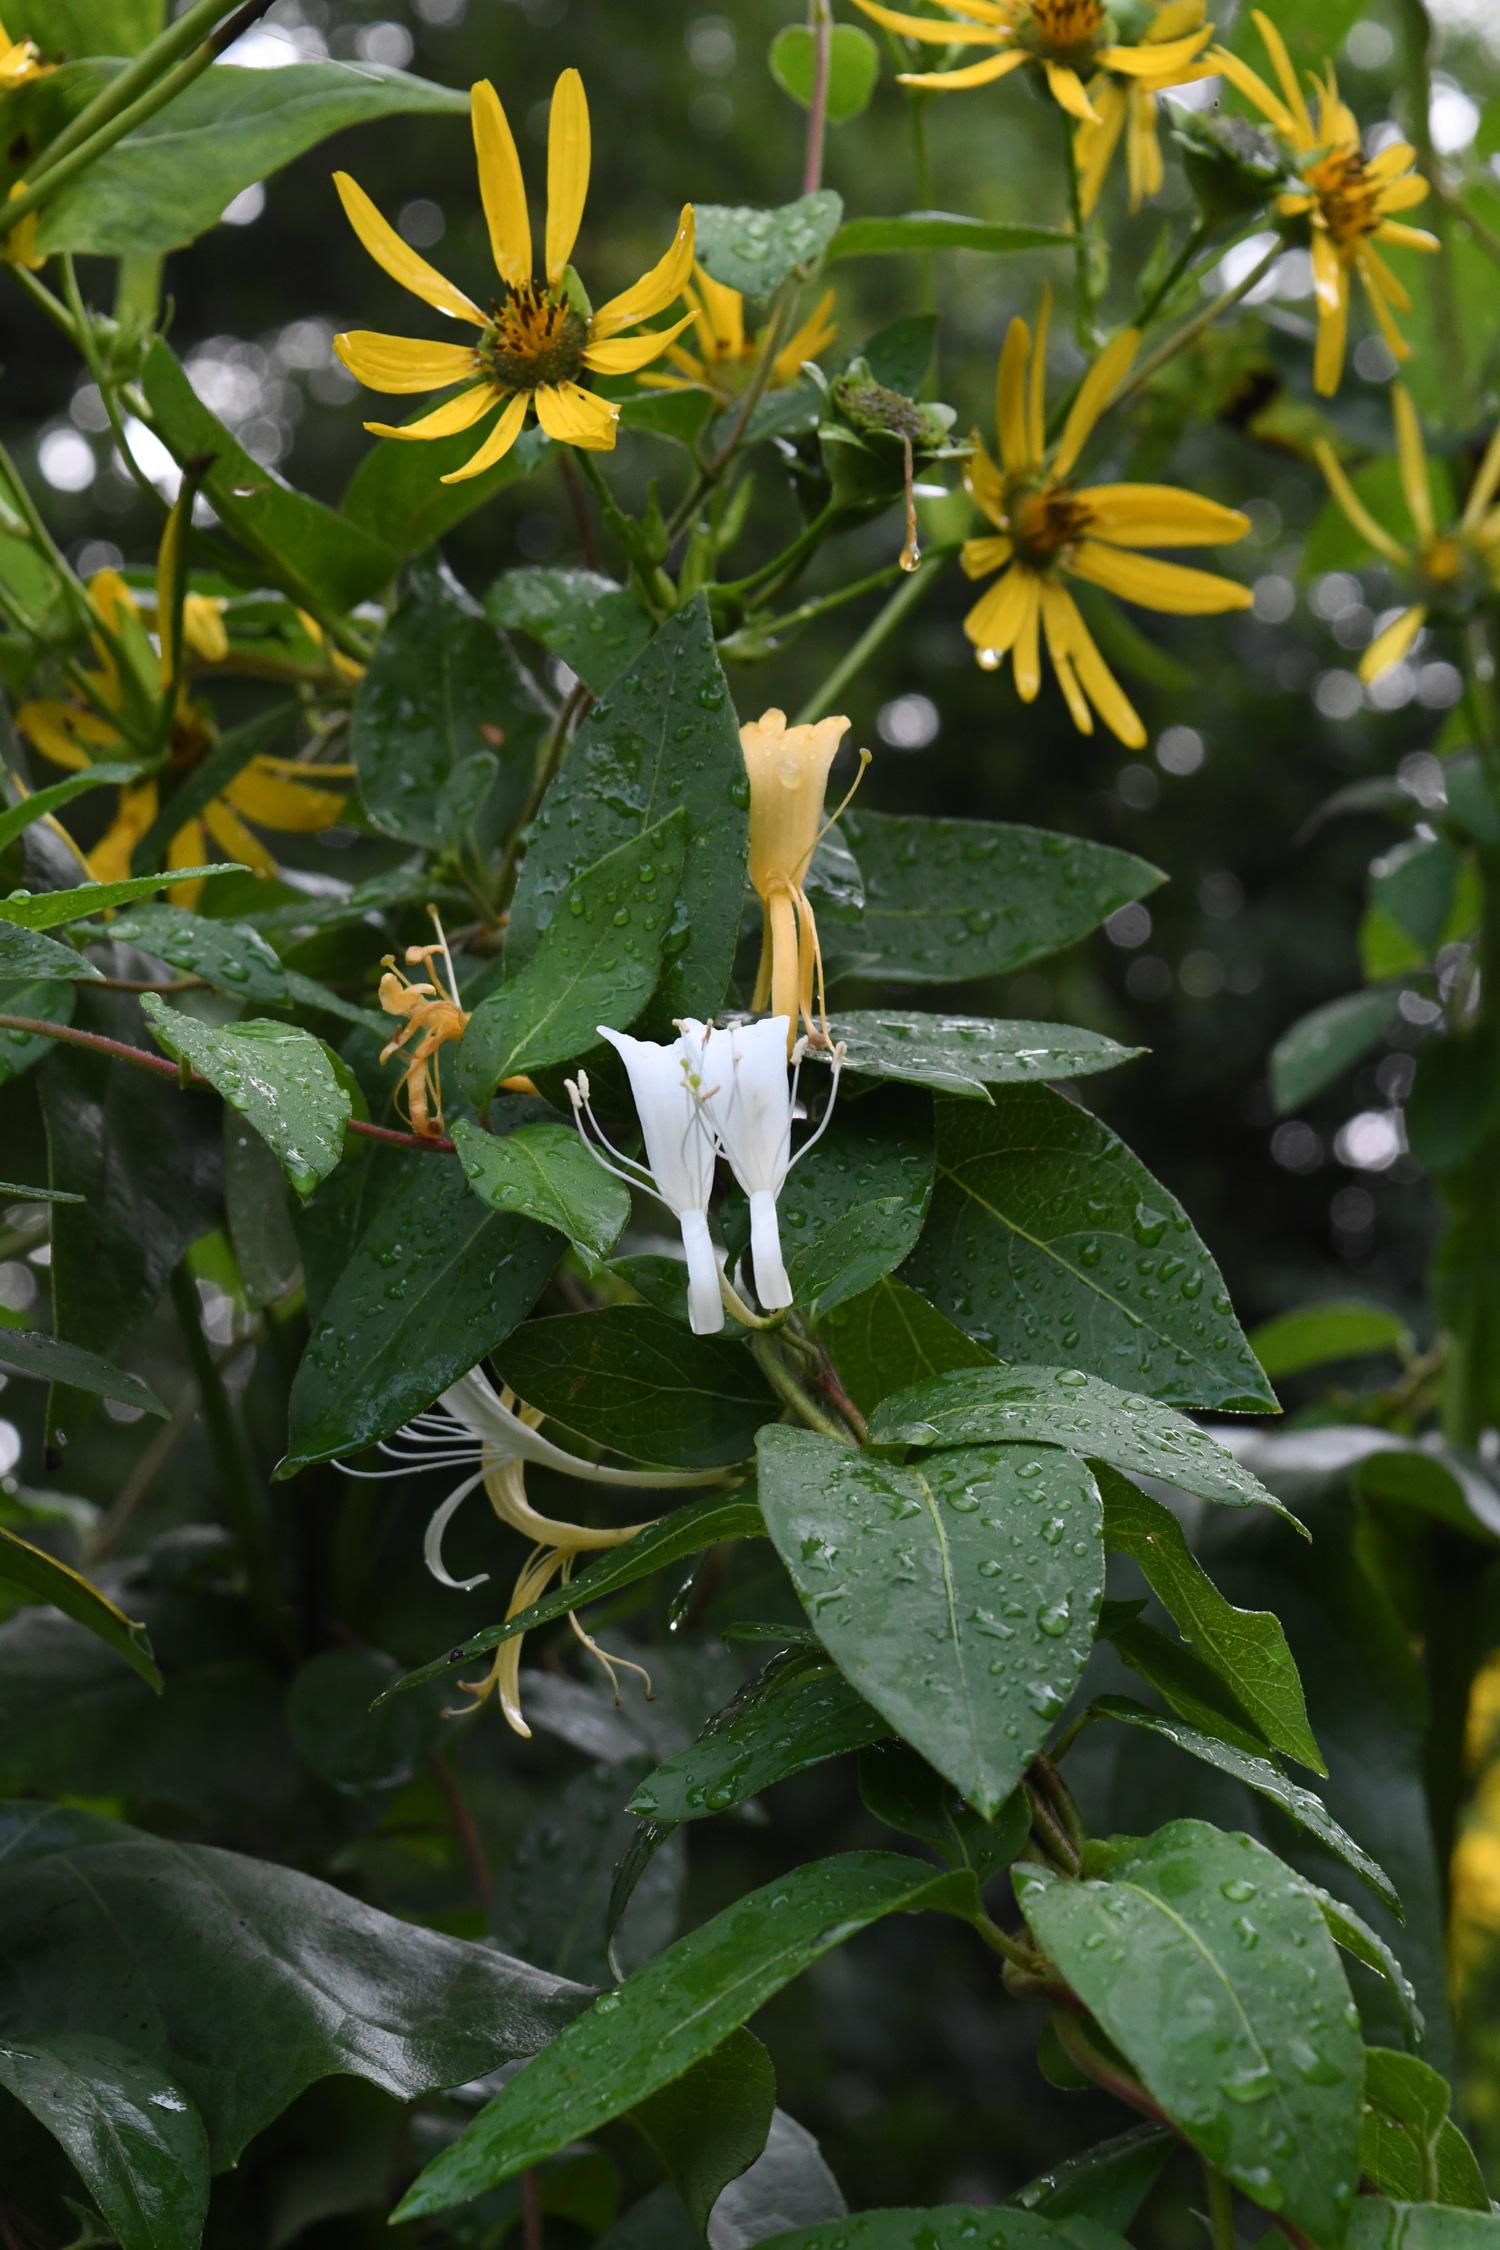 Rudbeckia and honeysuckle